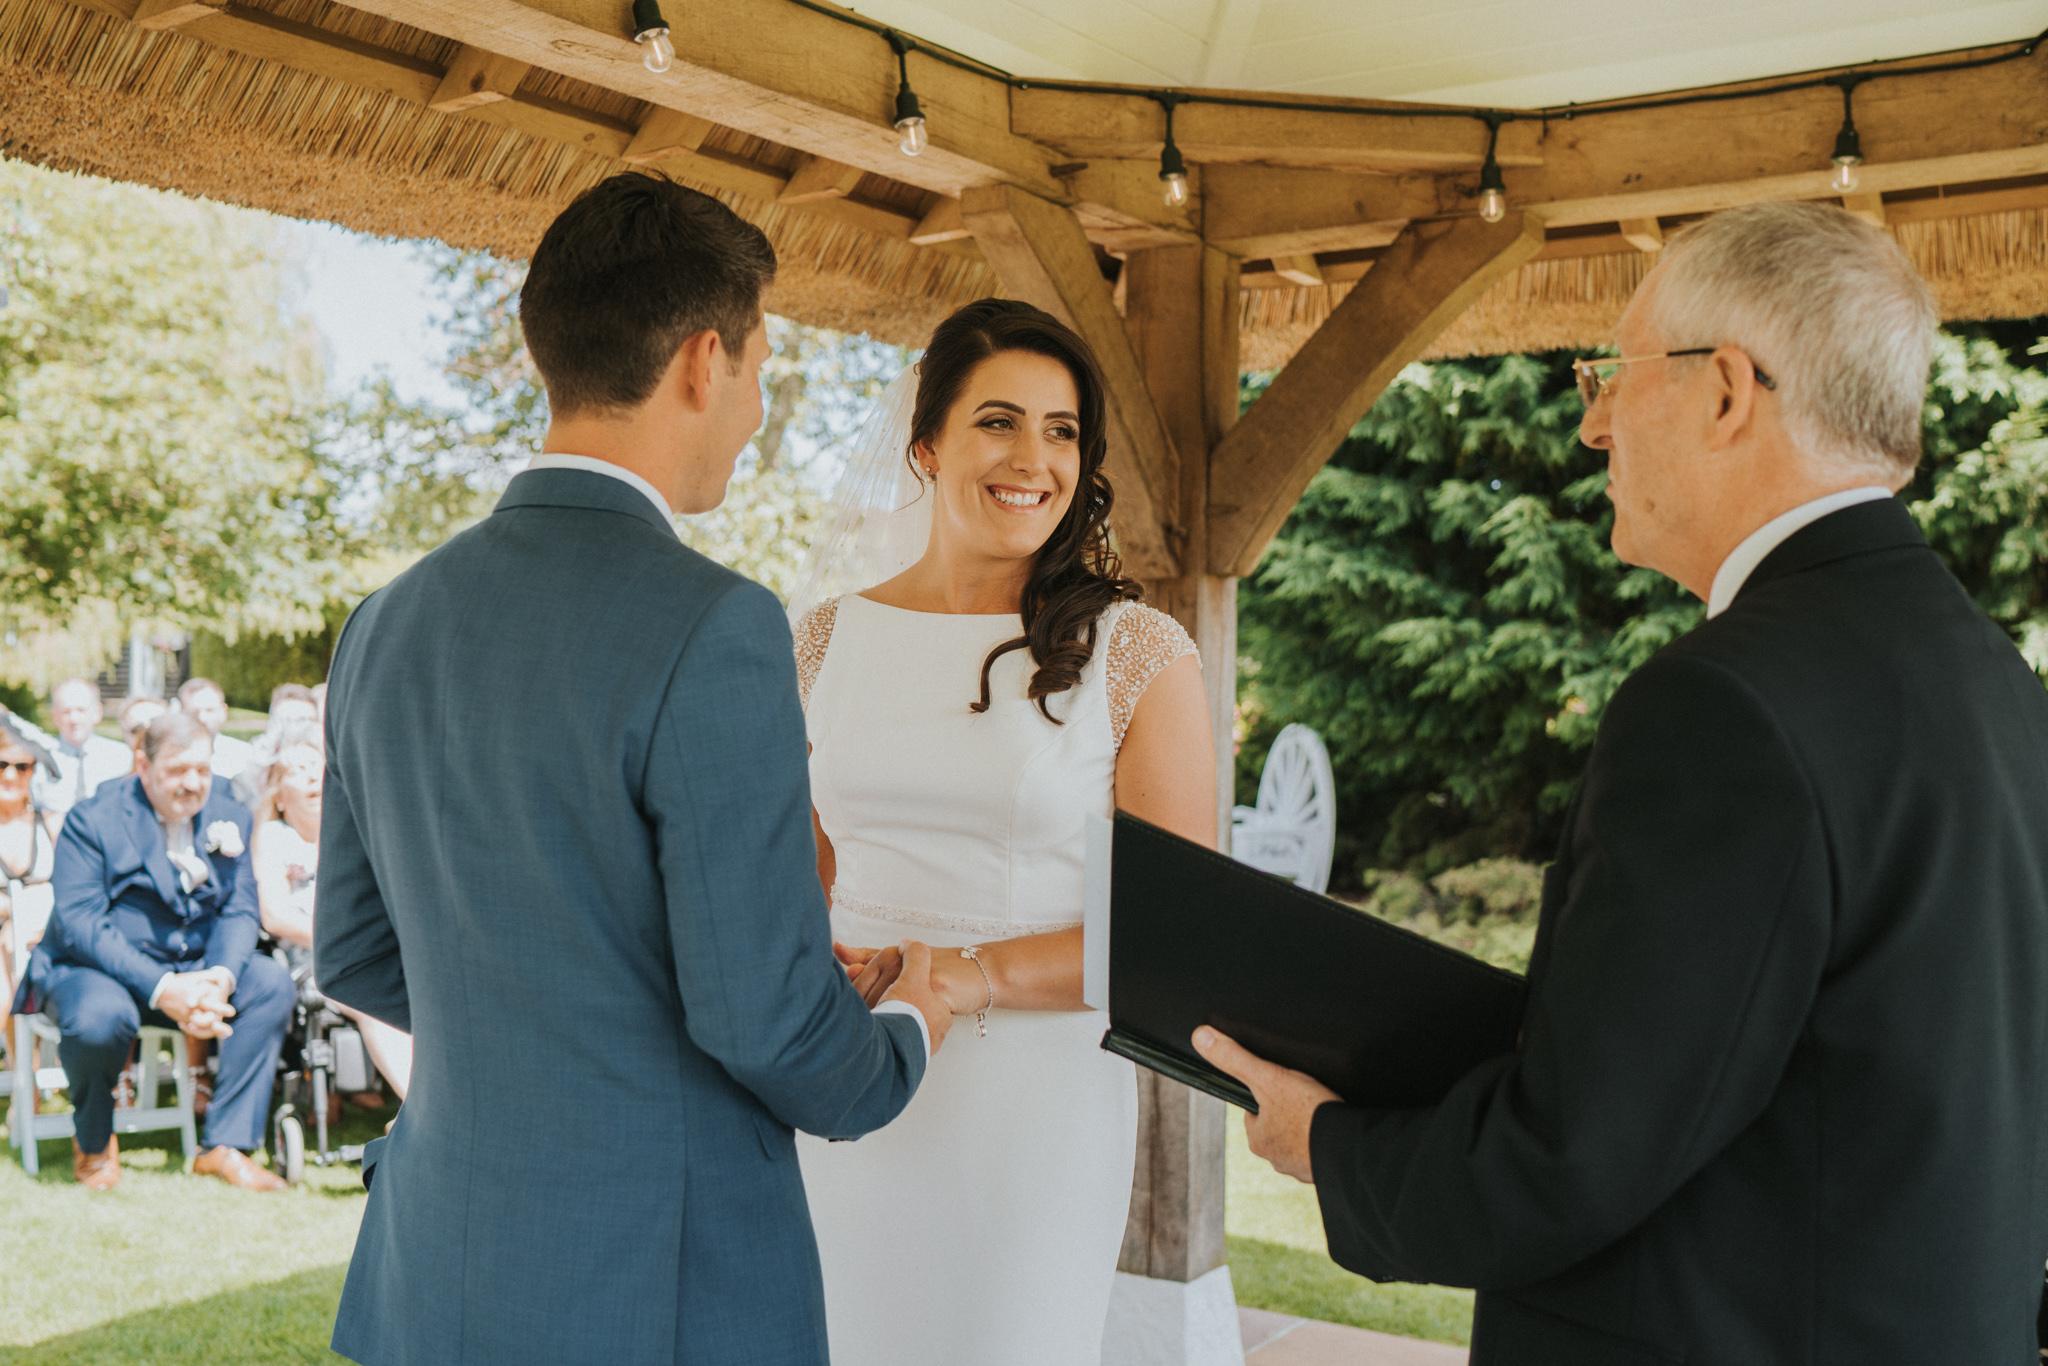 danielle-and-gareths-boho-wedding-previews-at-high-house-weddings-grace-elizabeth-colchester-essex-suffolk-norfolk-devon-alternative-wedding-and-lifestyle-photographer (30 of 76).jpg